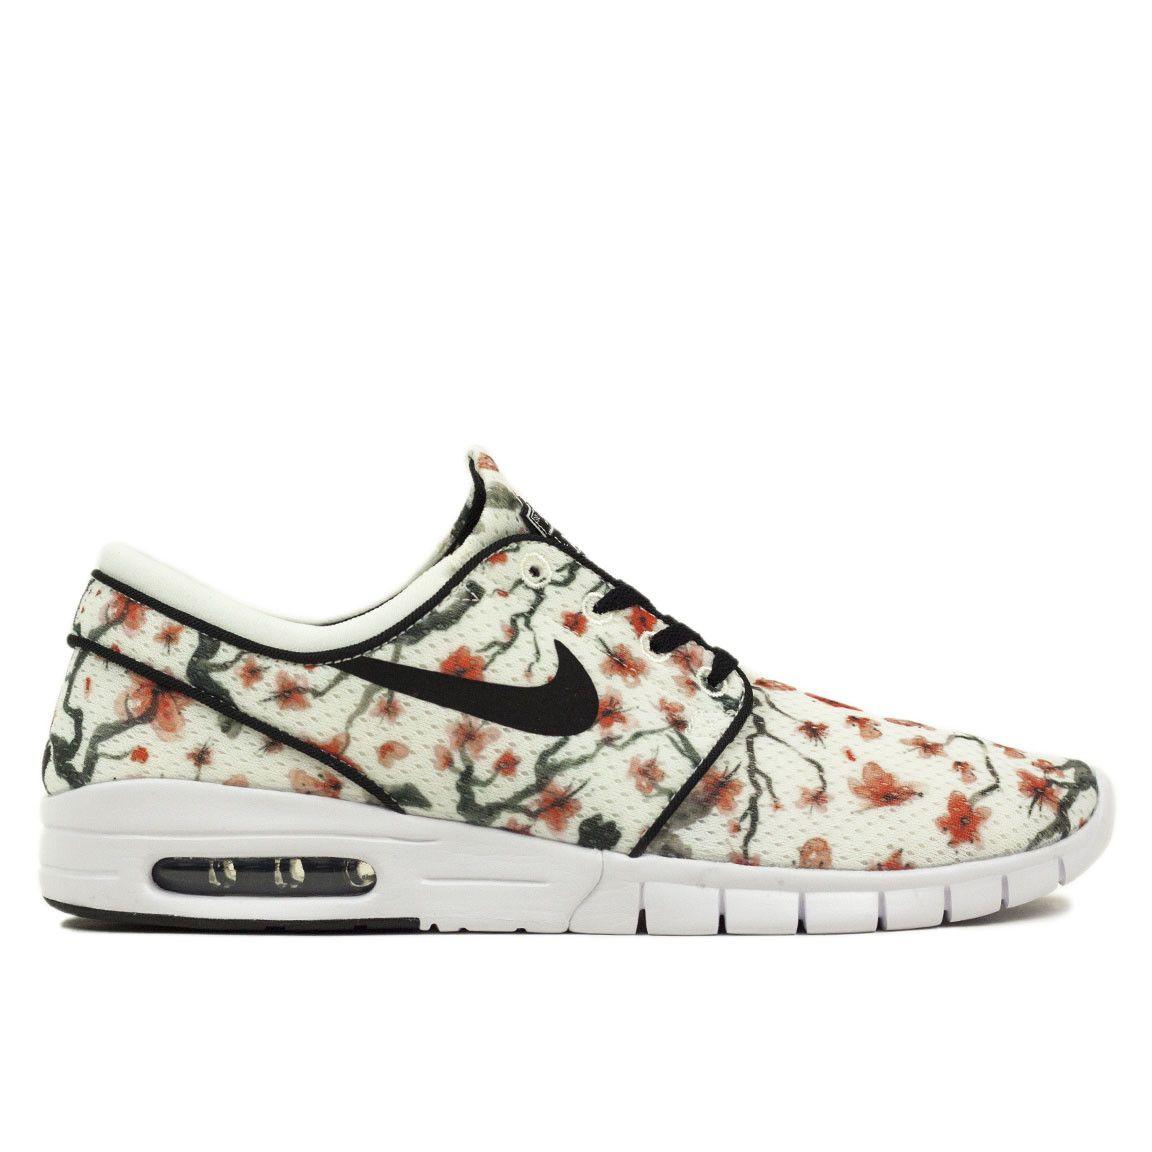 1351ae8f8dad Nike SB Stefan Janoski Max PRM Cherry Blossom - Sail Black White – Commonn